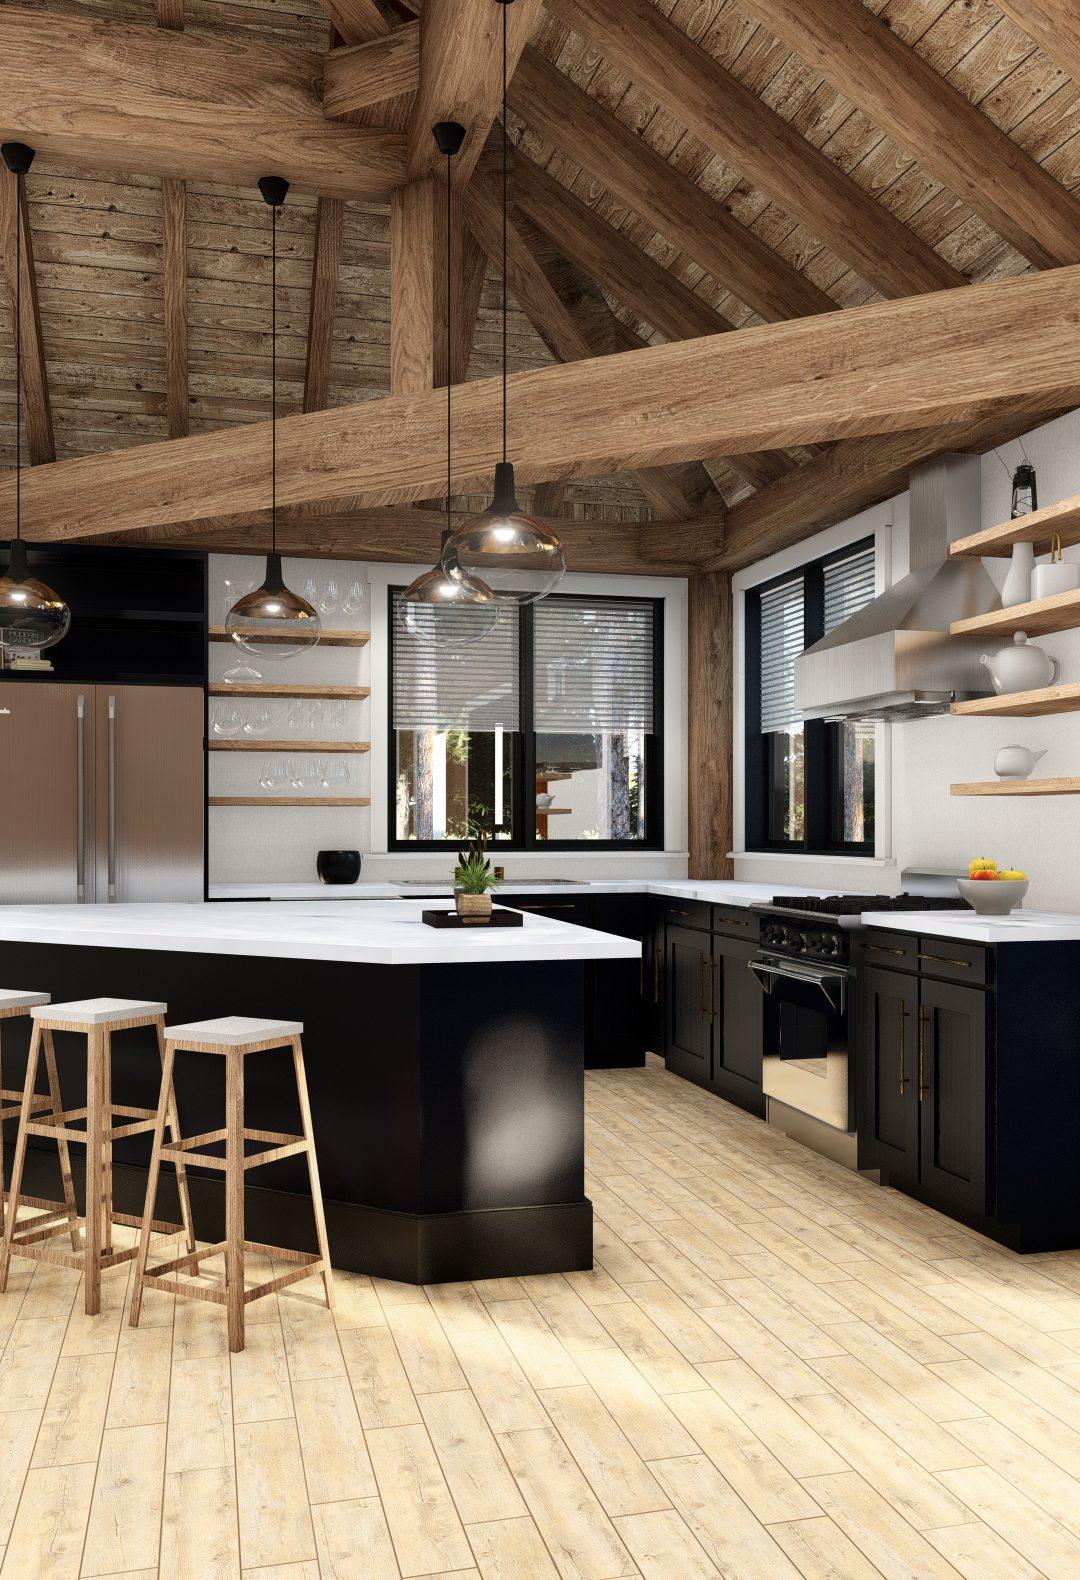 Normerica Timber Frames, House Plan, The Britt 3954, Interior, Kitchen